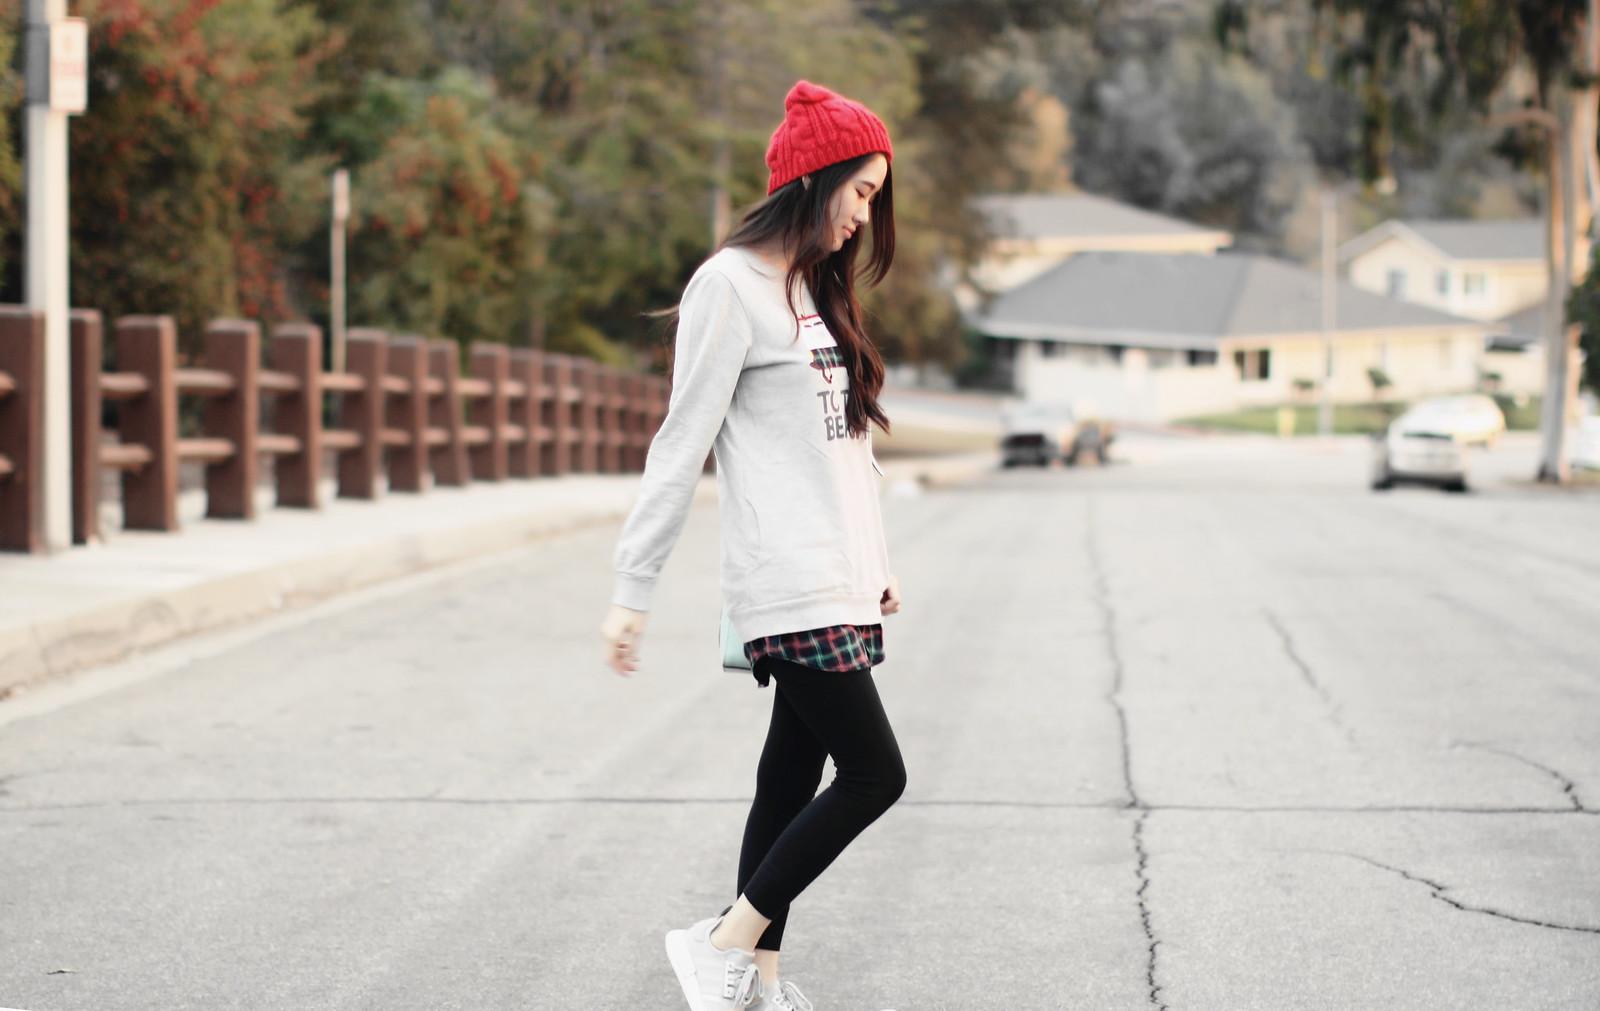 1259-ootd-sweaterdress-koreanfashion-asianfashion-korean-fall-yesstyle-sweaterweather-clothestoyouuu-blogger-elizabeeetht